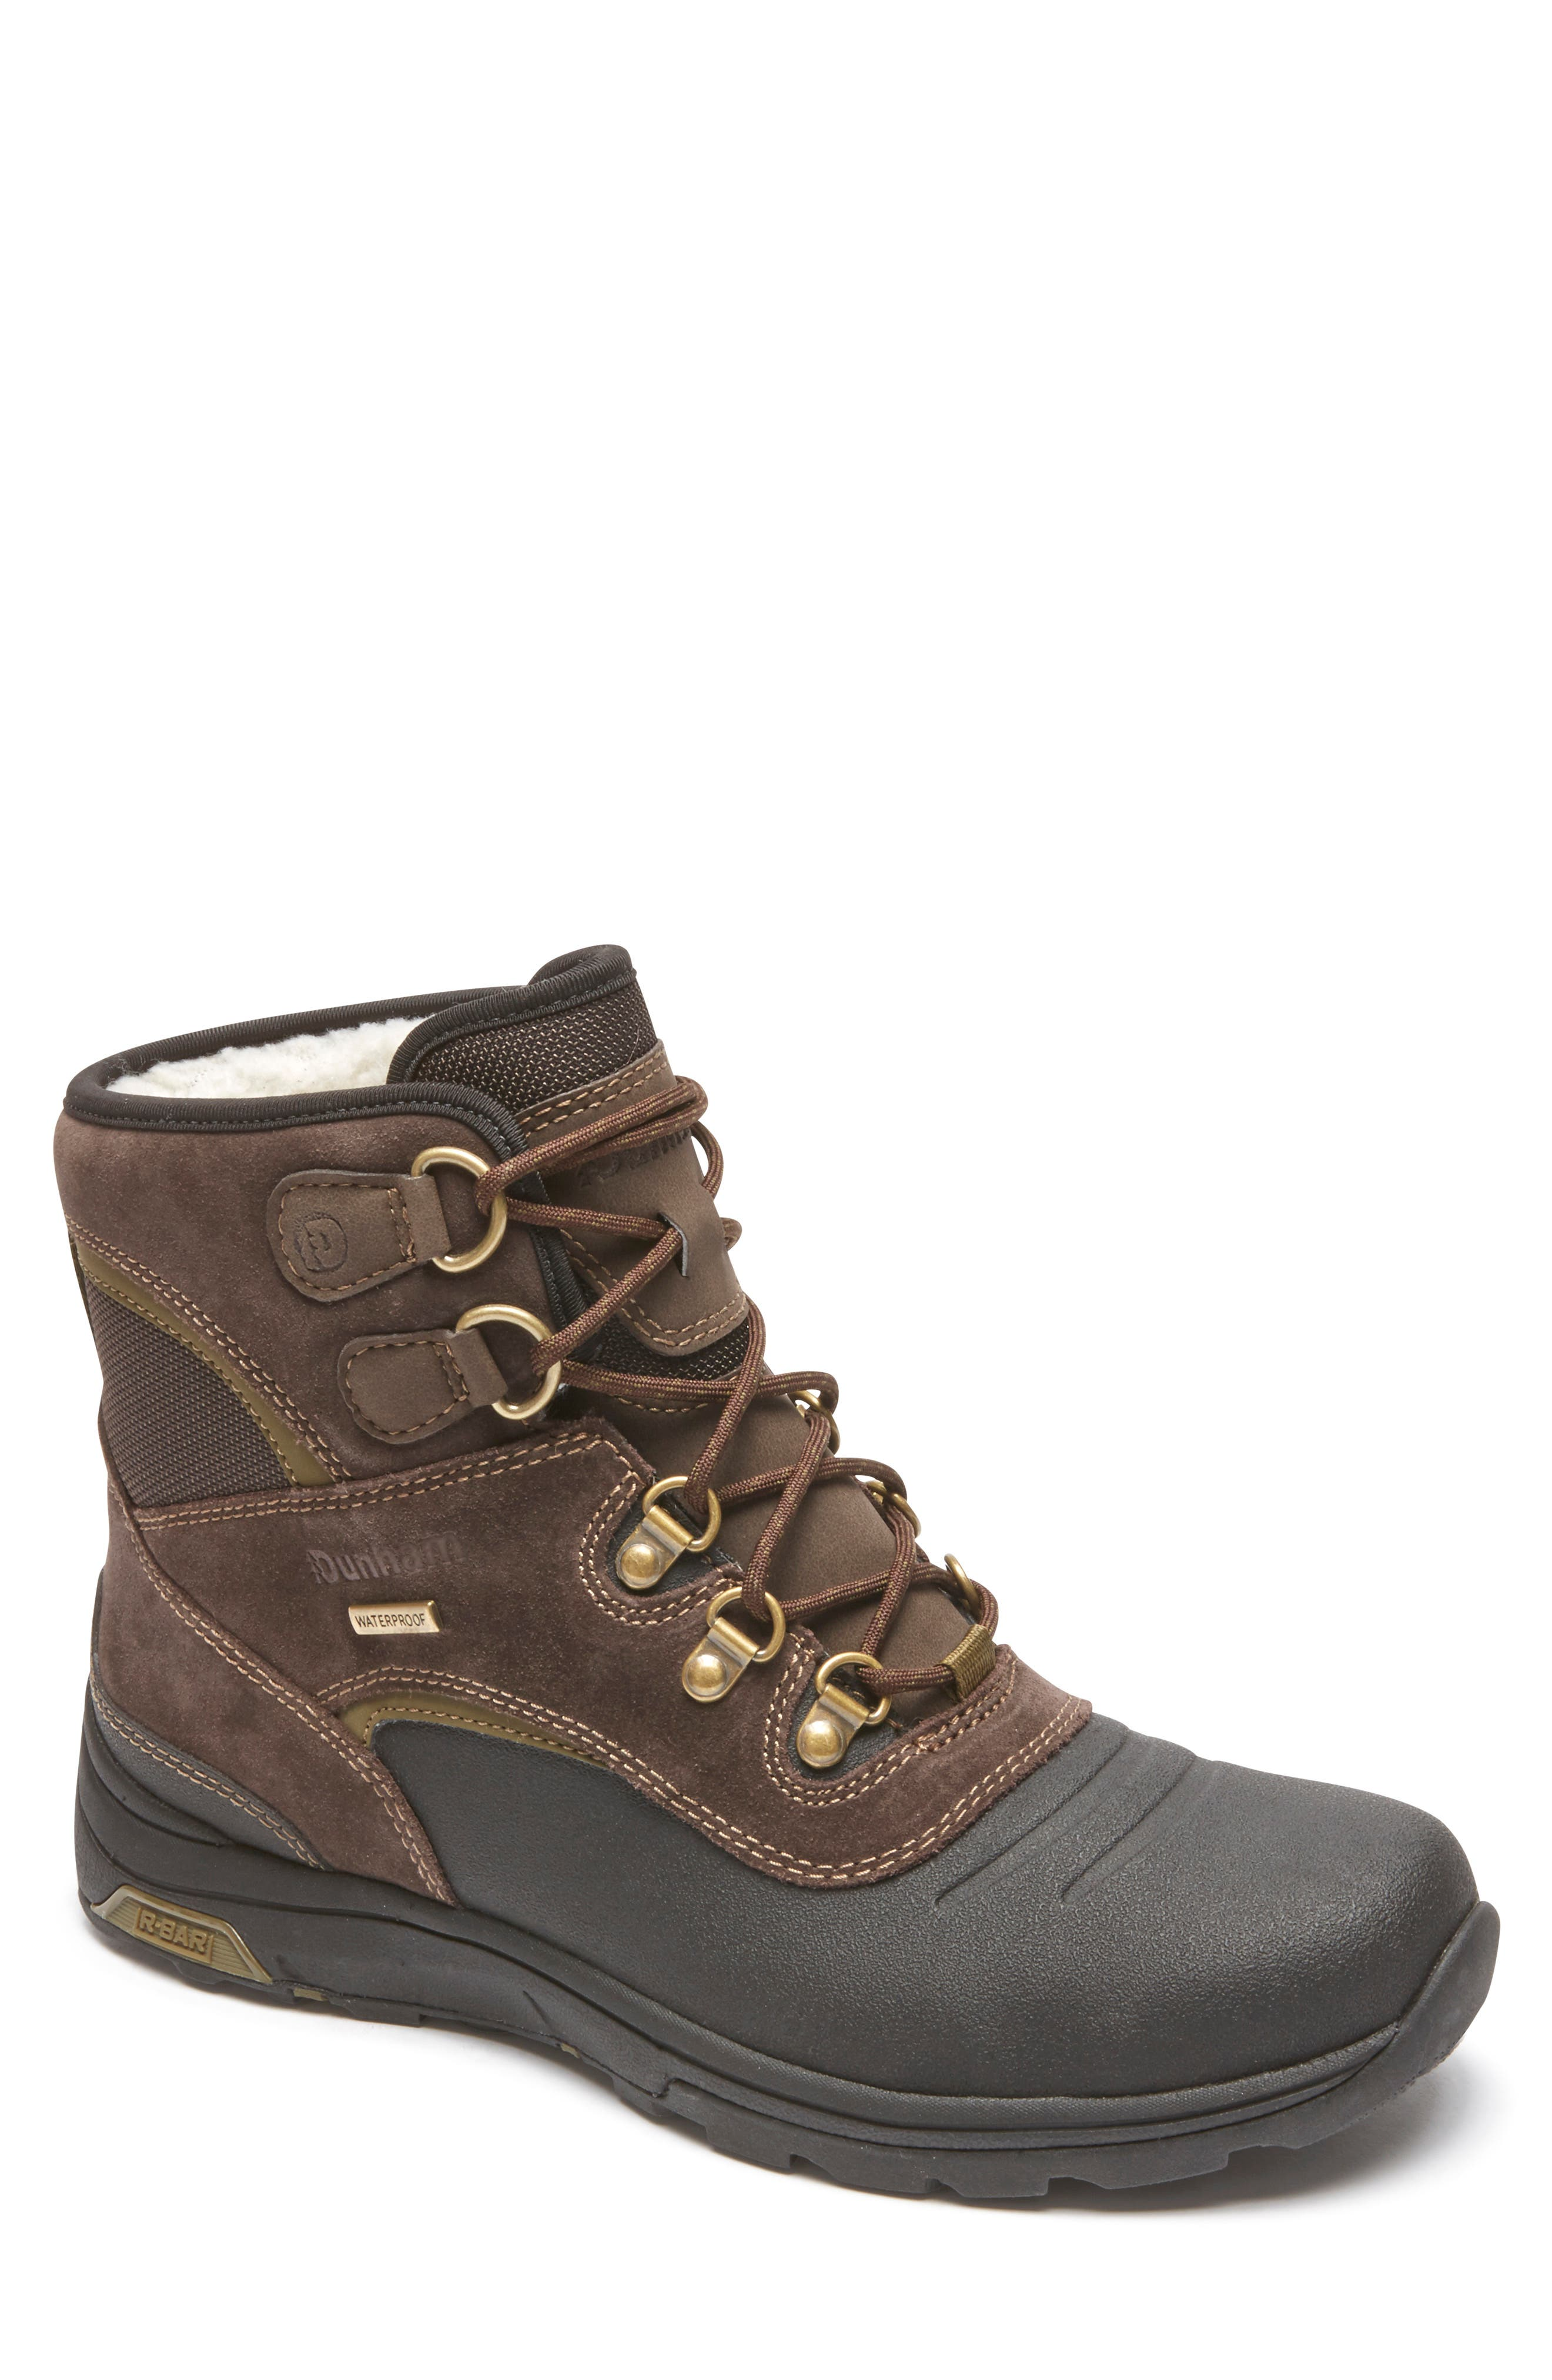 Trukka Waterproof Boot